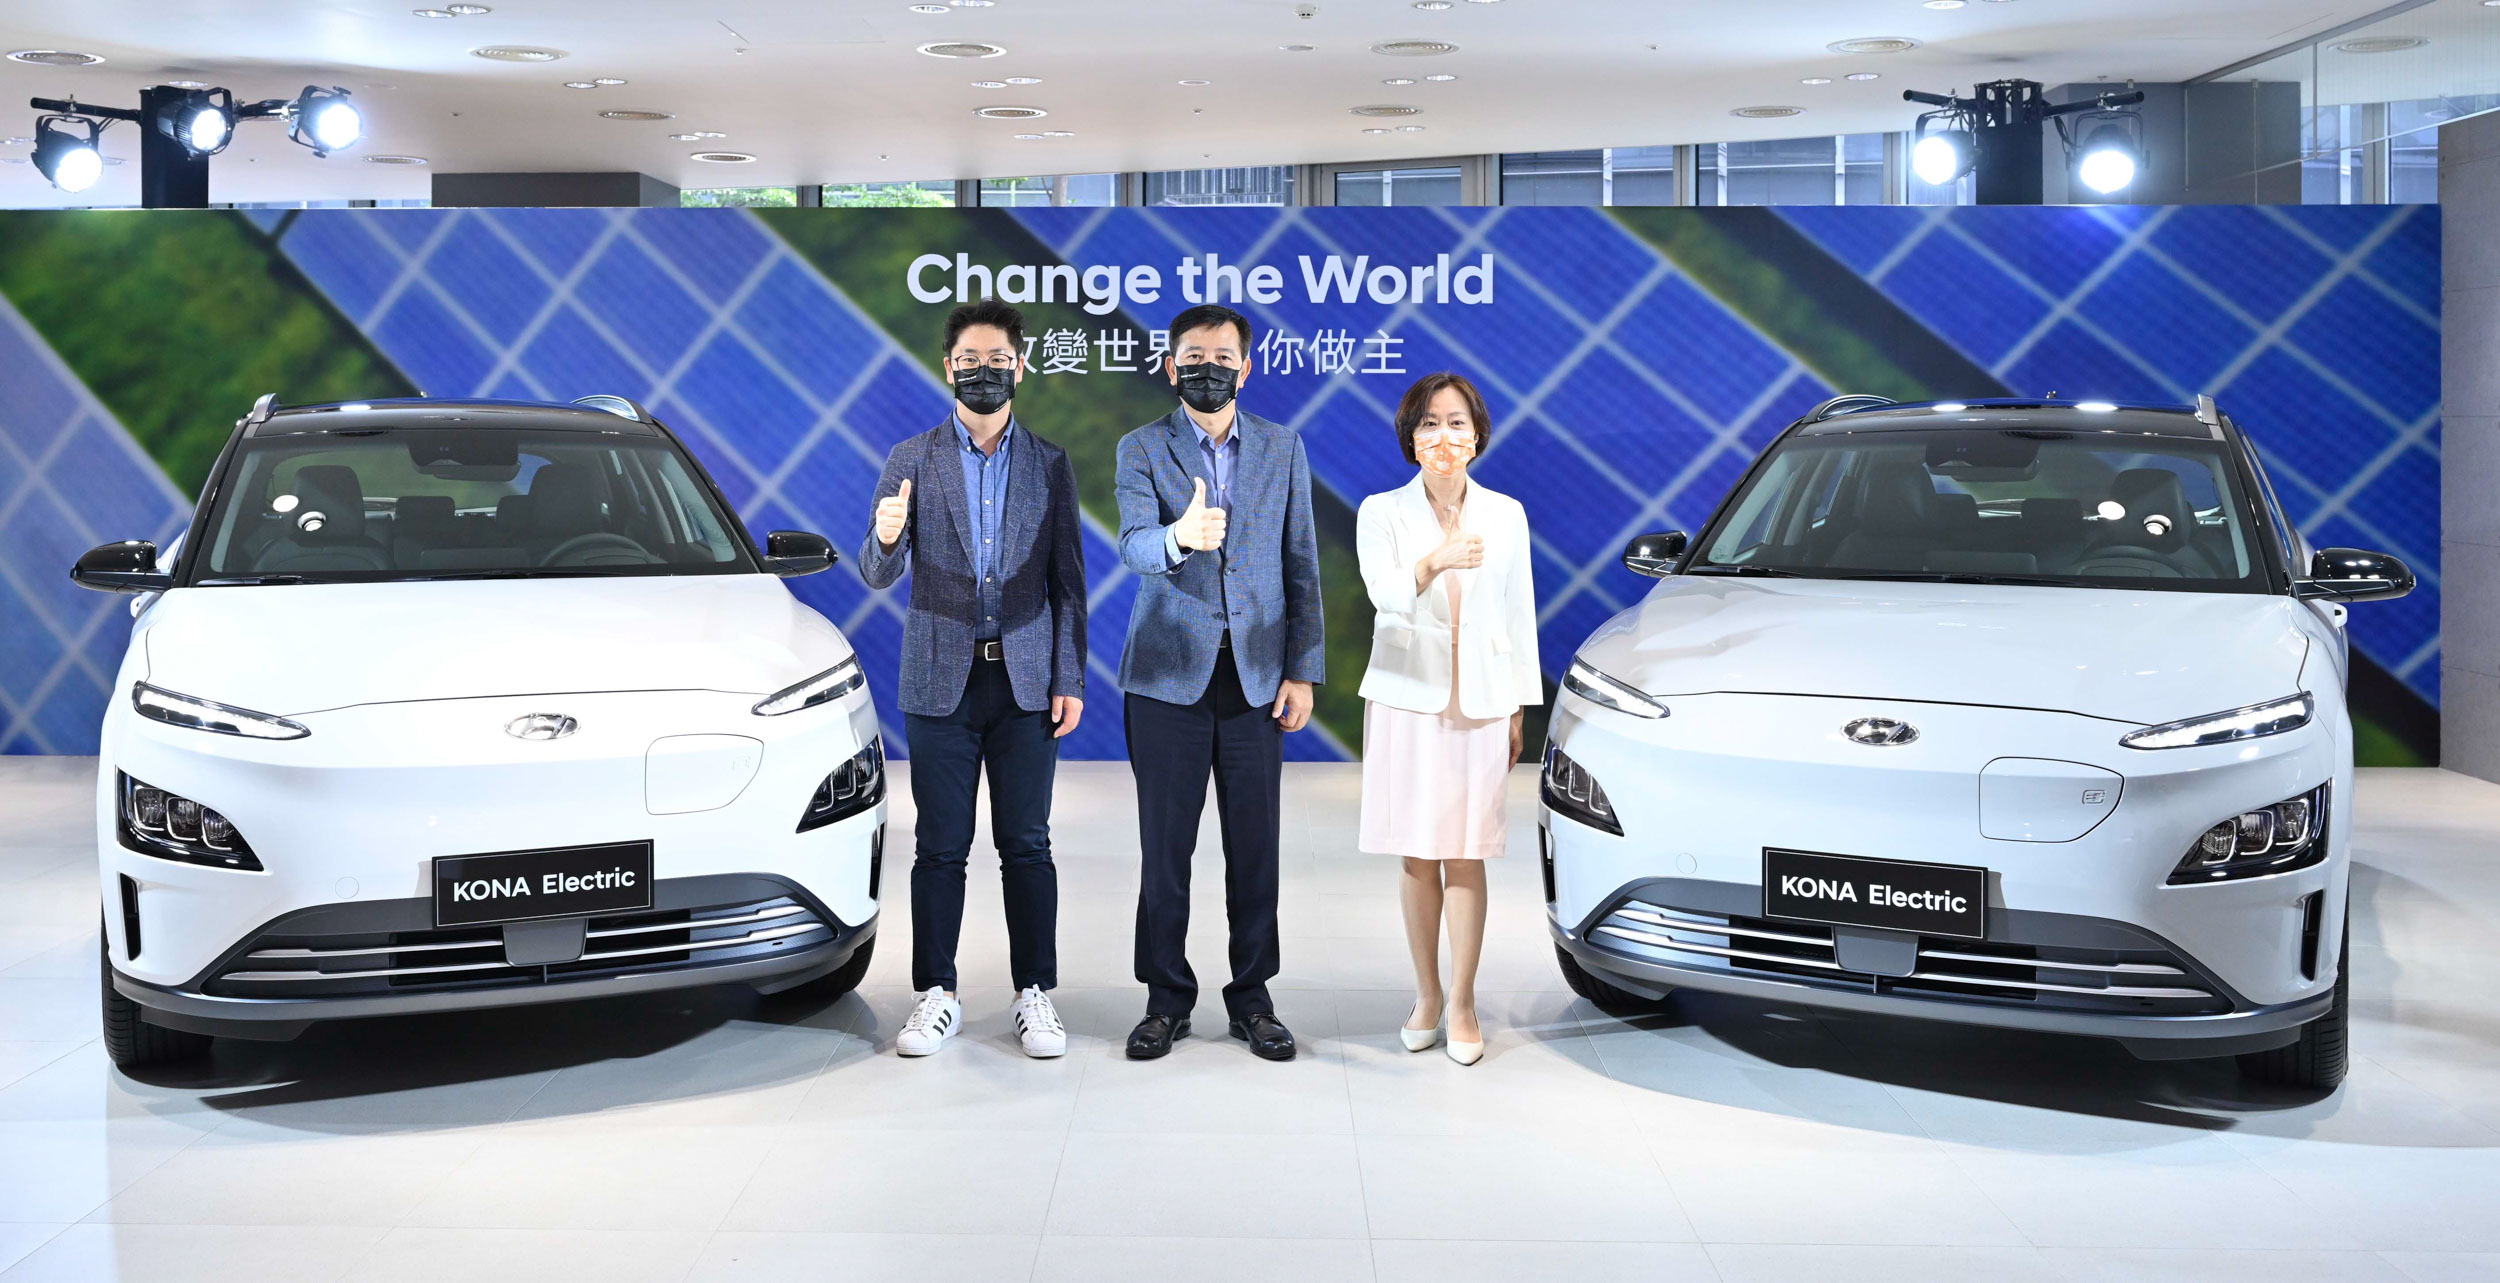 Hyundai Kona Electric 純電跑旅 124.9 萬起發表!上市優惠 119.9 萬榮登台灣最便宜電動車